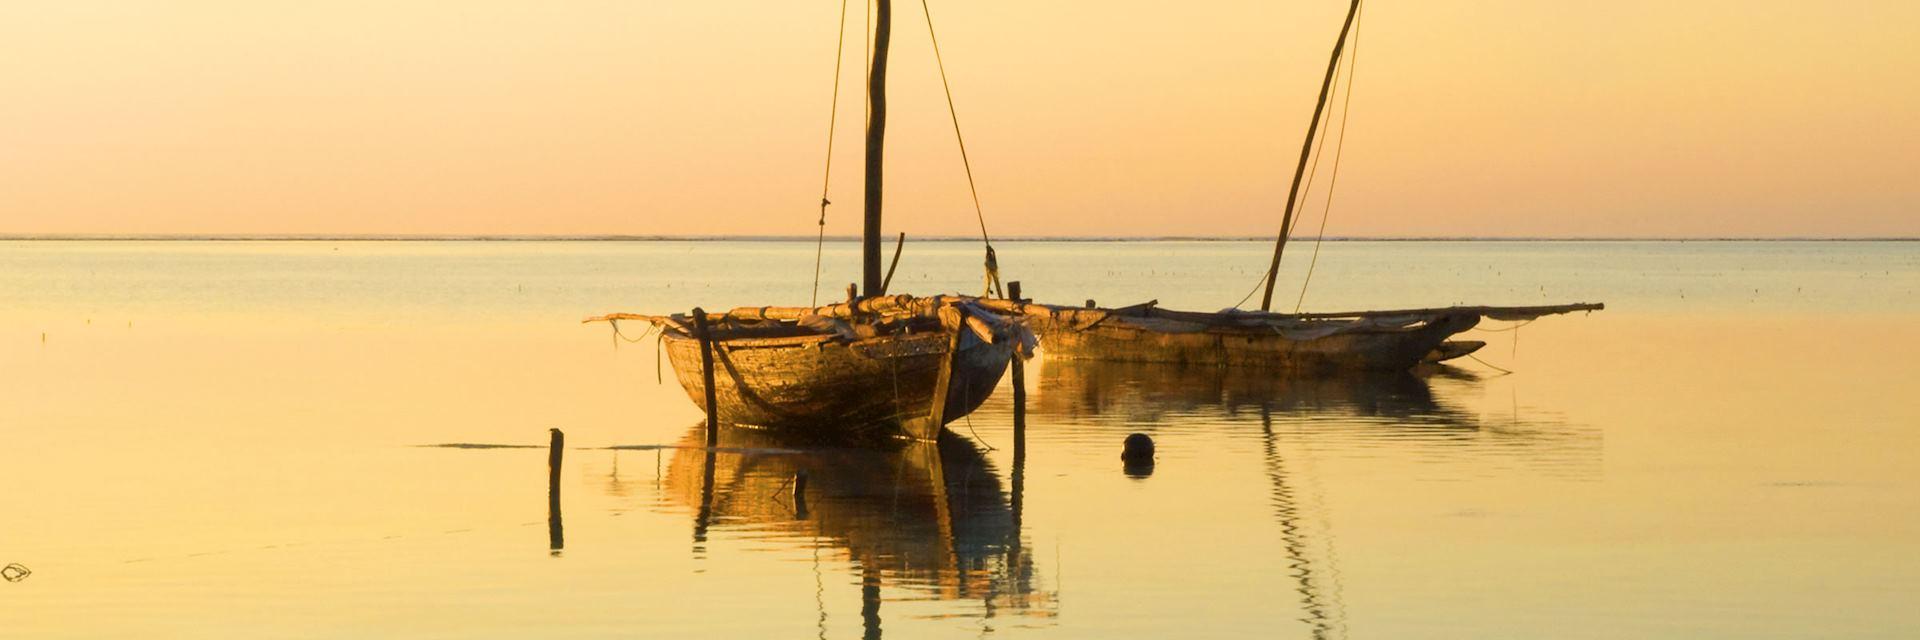 Sunrise on Zanzibar